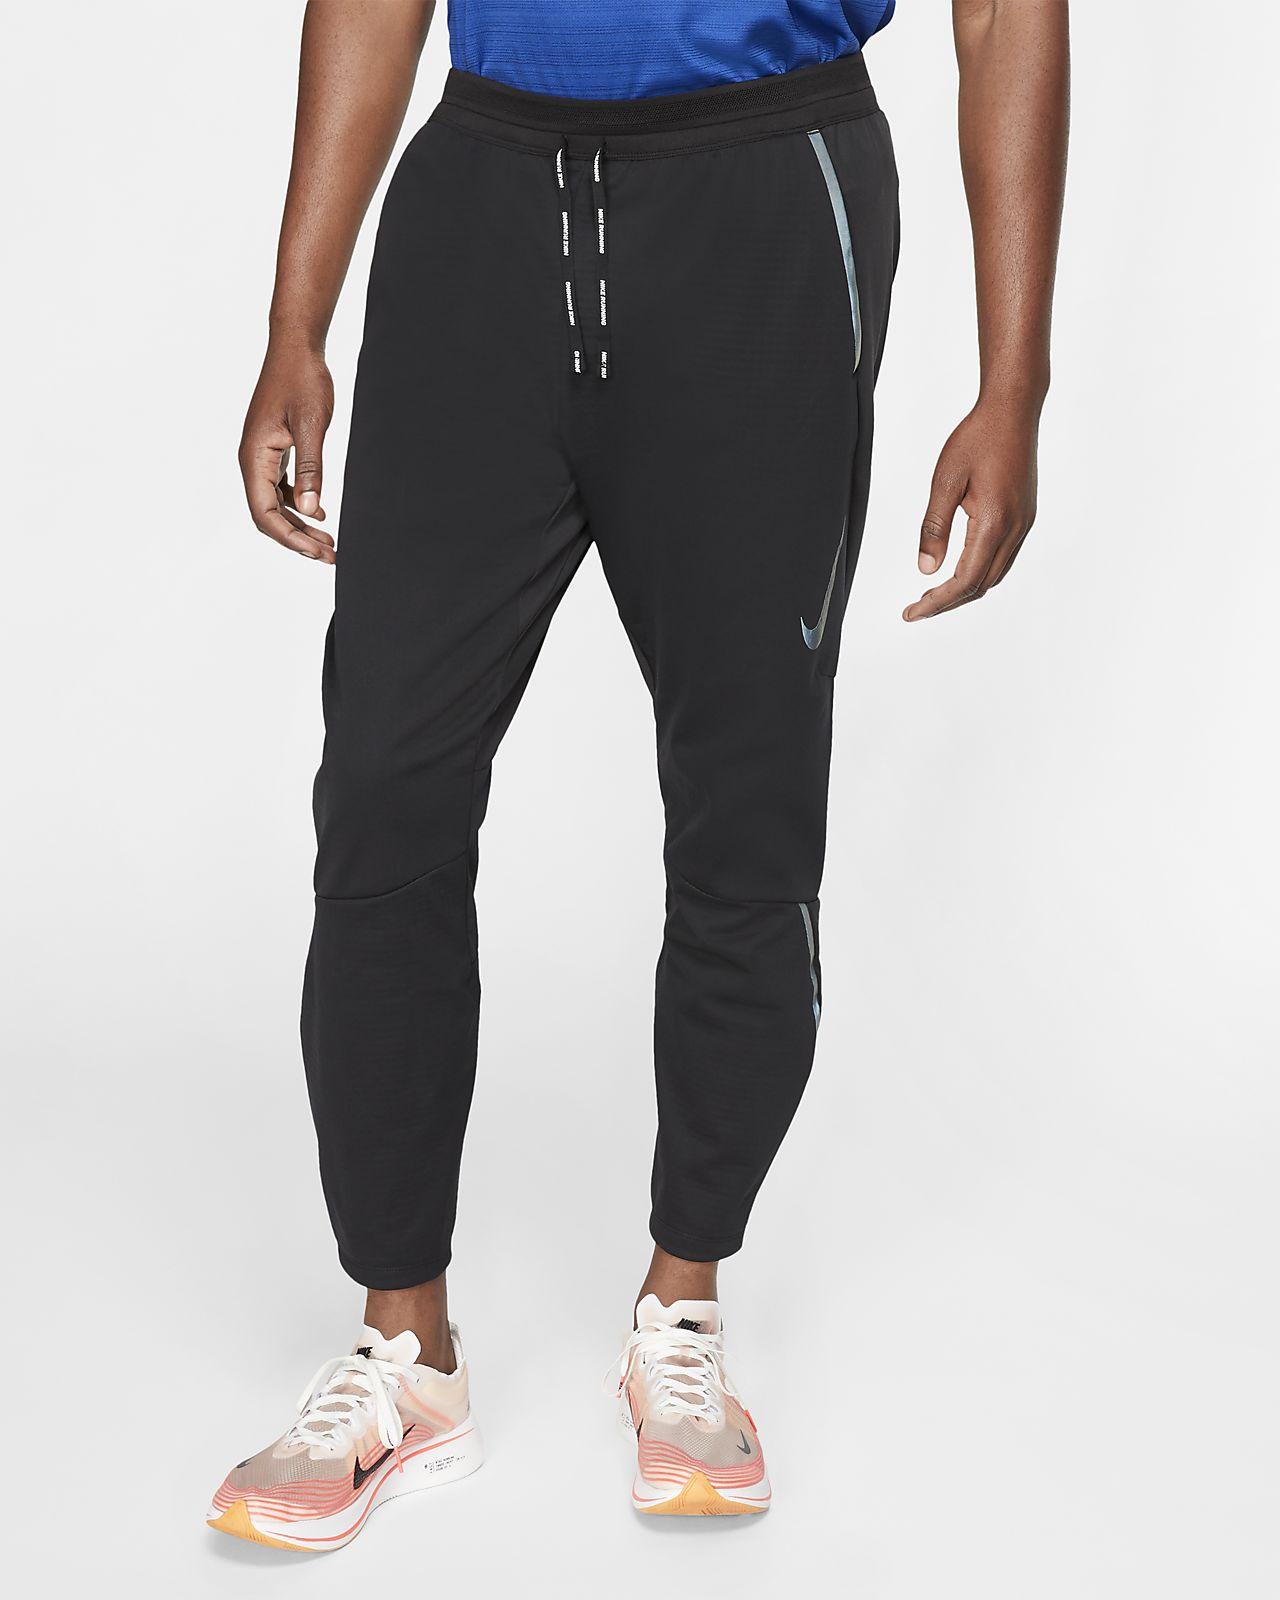 Nike Shield Swift Men's Running Trousers